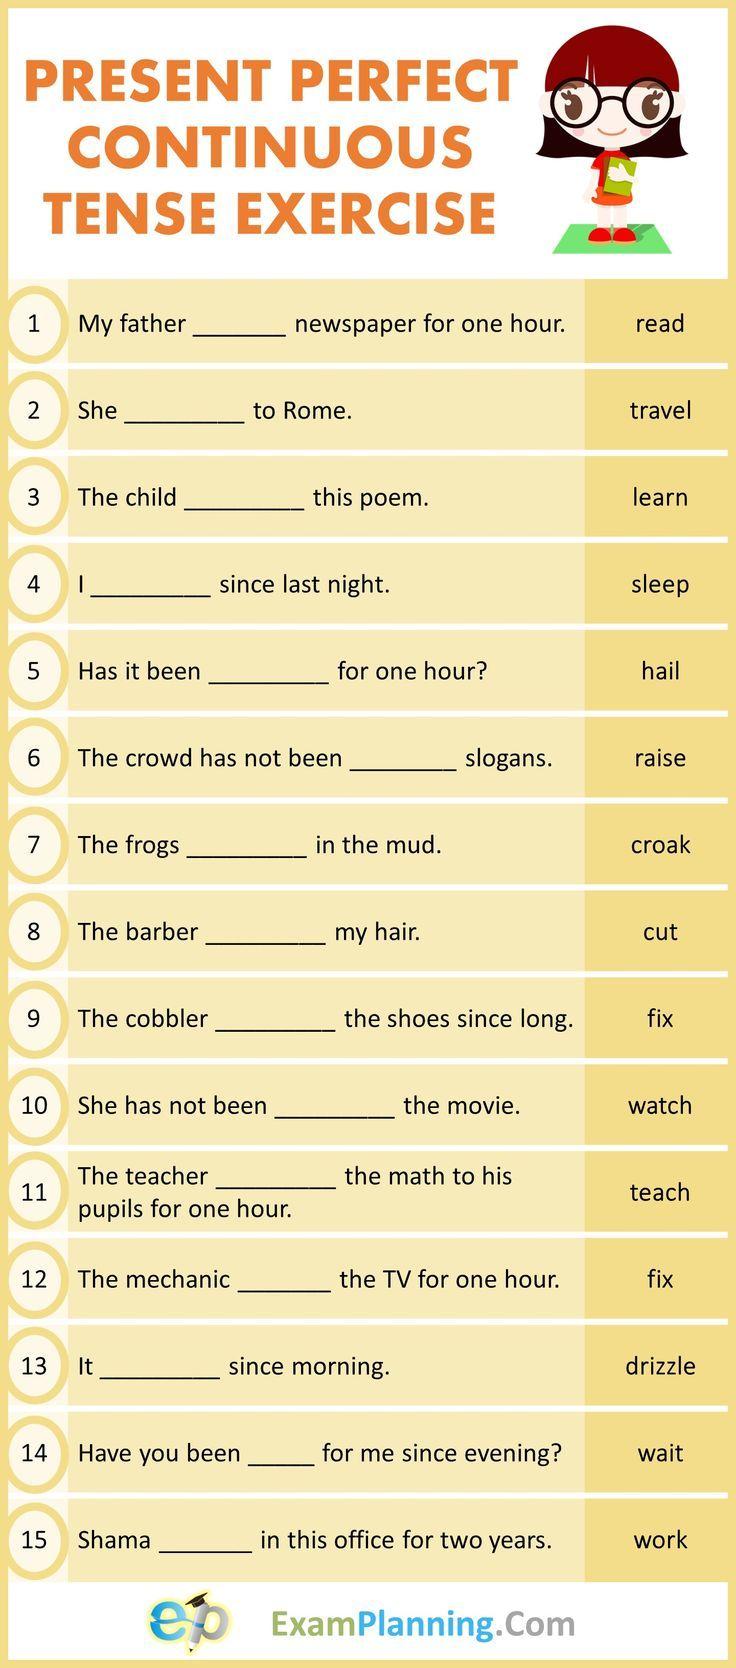 Present Perfect Continuous Tense Exercises Tenses Exercises Present Perfect English Grammar Exercises